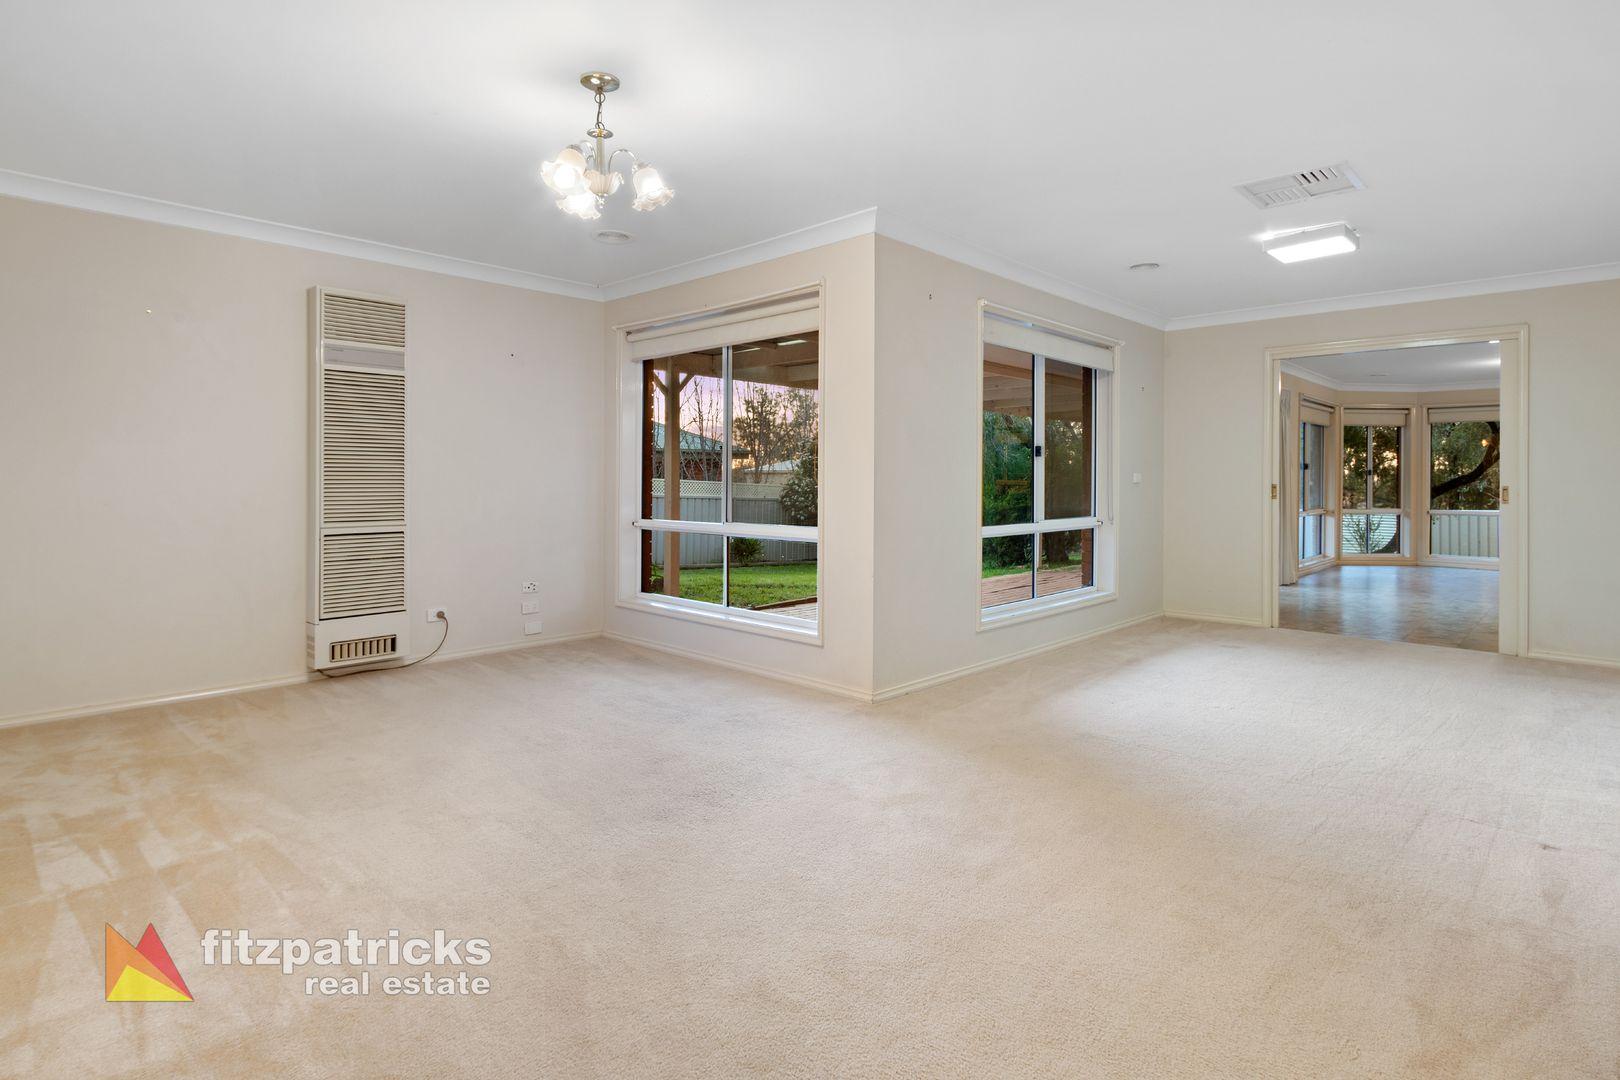 17 Bourkelands Drive, Bourkelands NSW 2650, Image 1